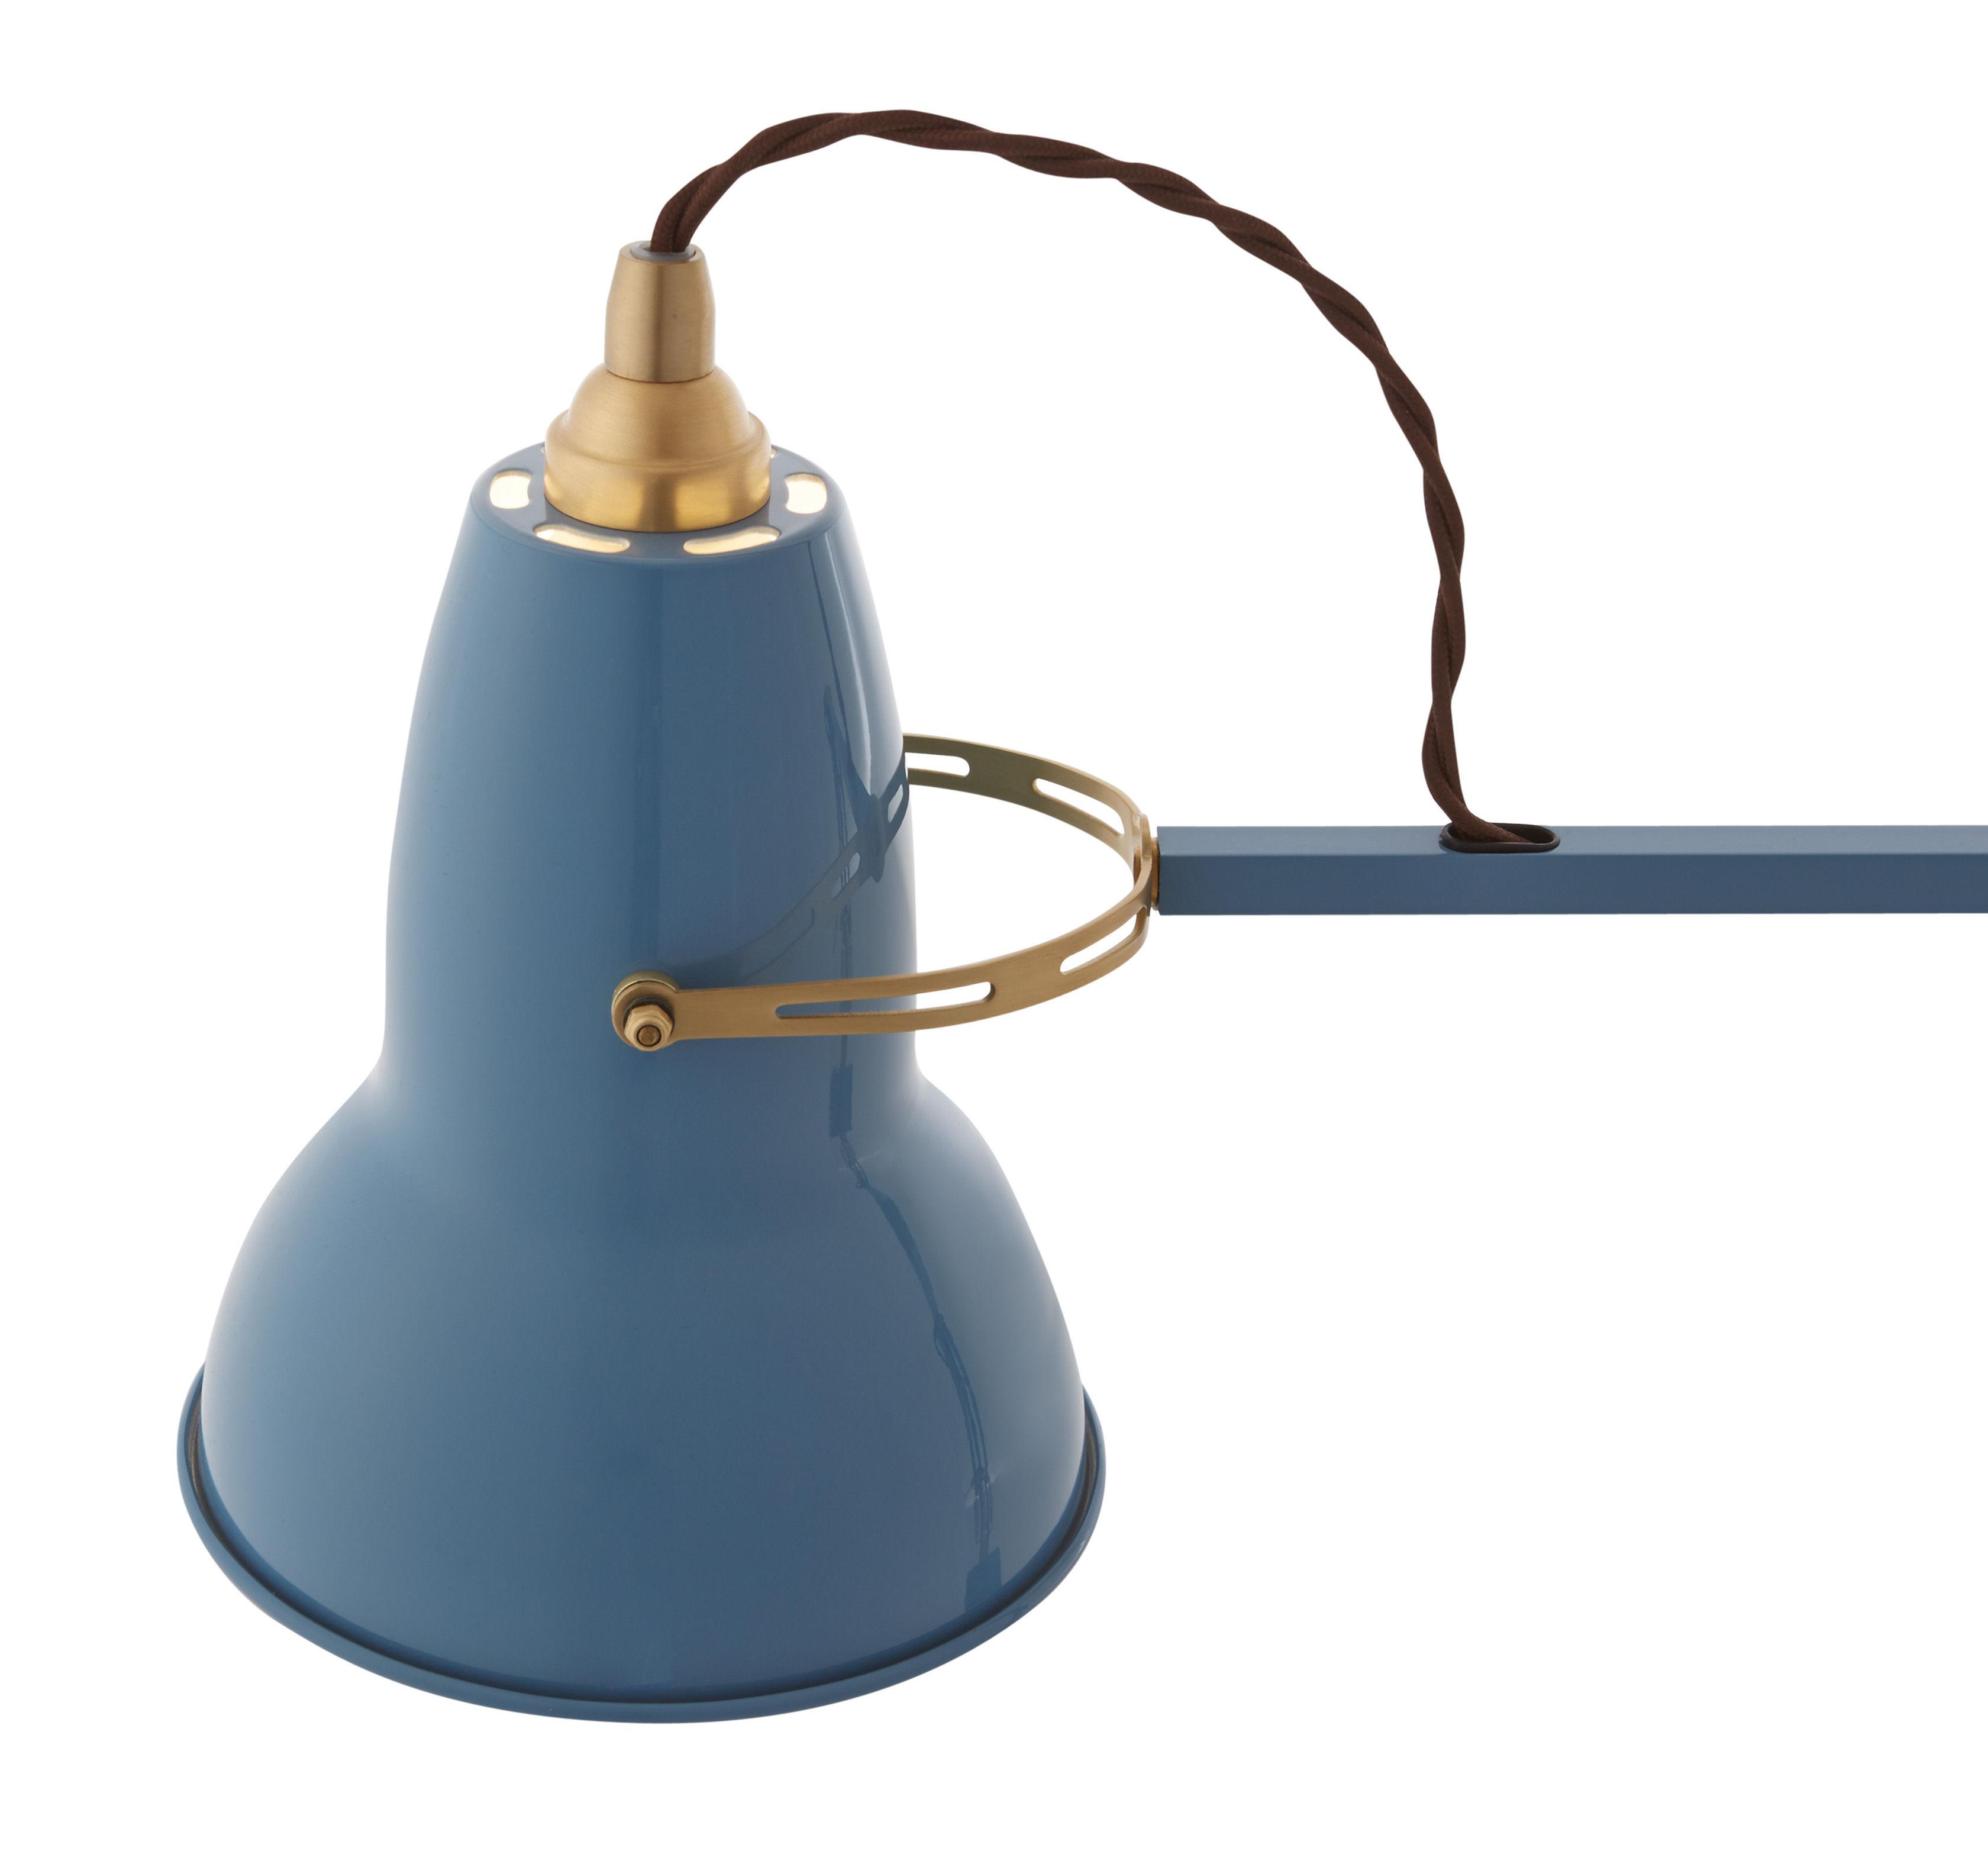 applique original 1227 laiton bras articul bleu. Black Bedroom Furniture Sets. Home Design Ideas